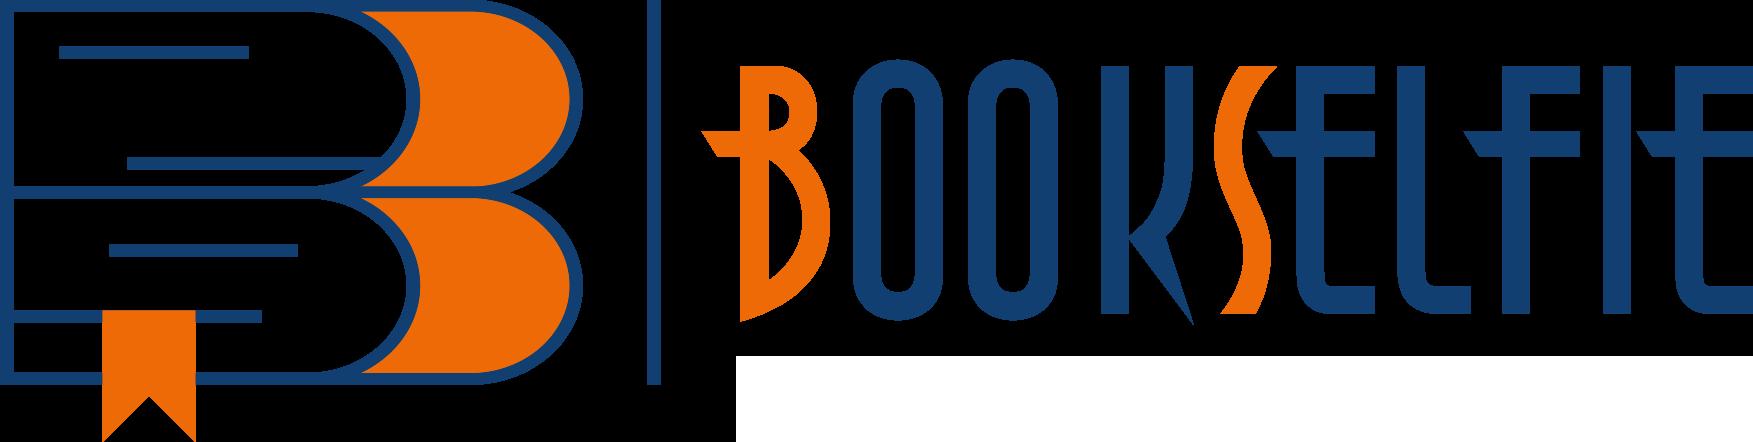 Book Selfie Logo